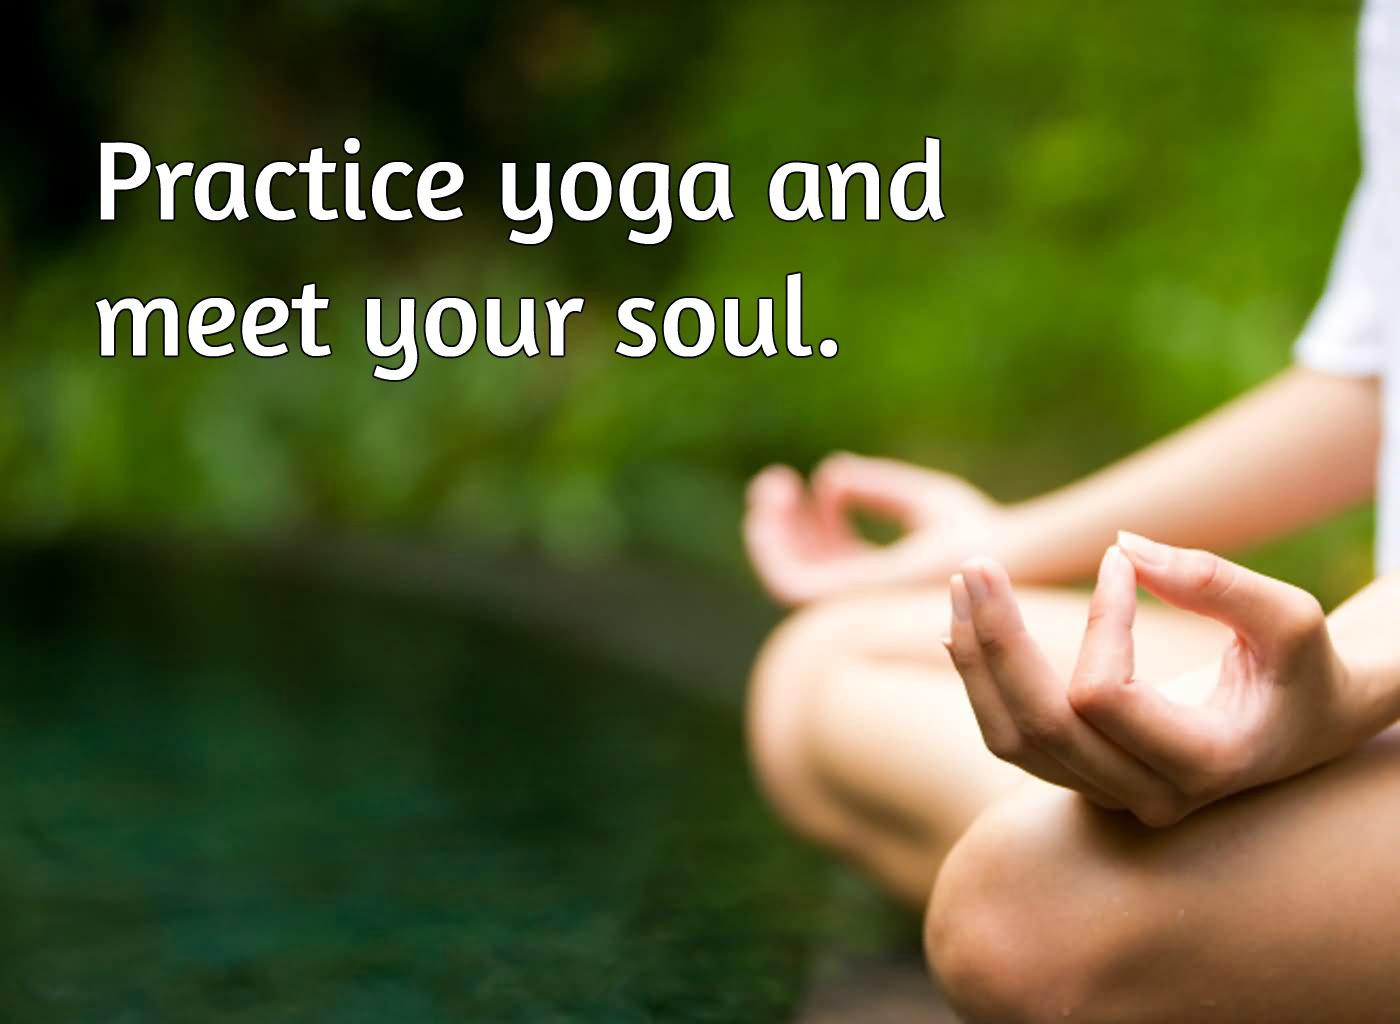 Yoga Slogans